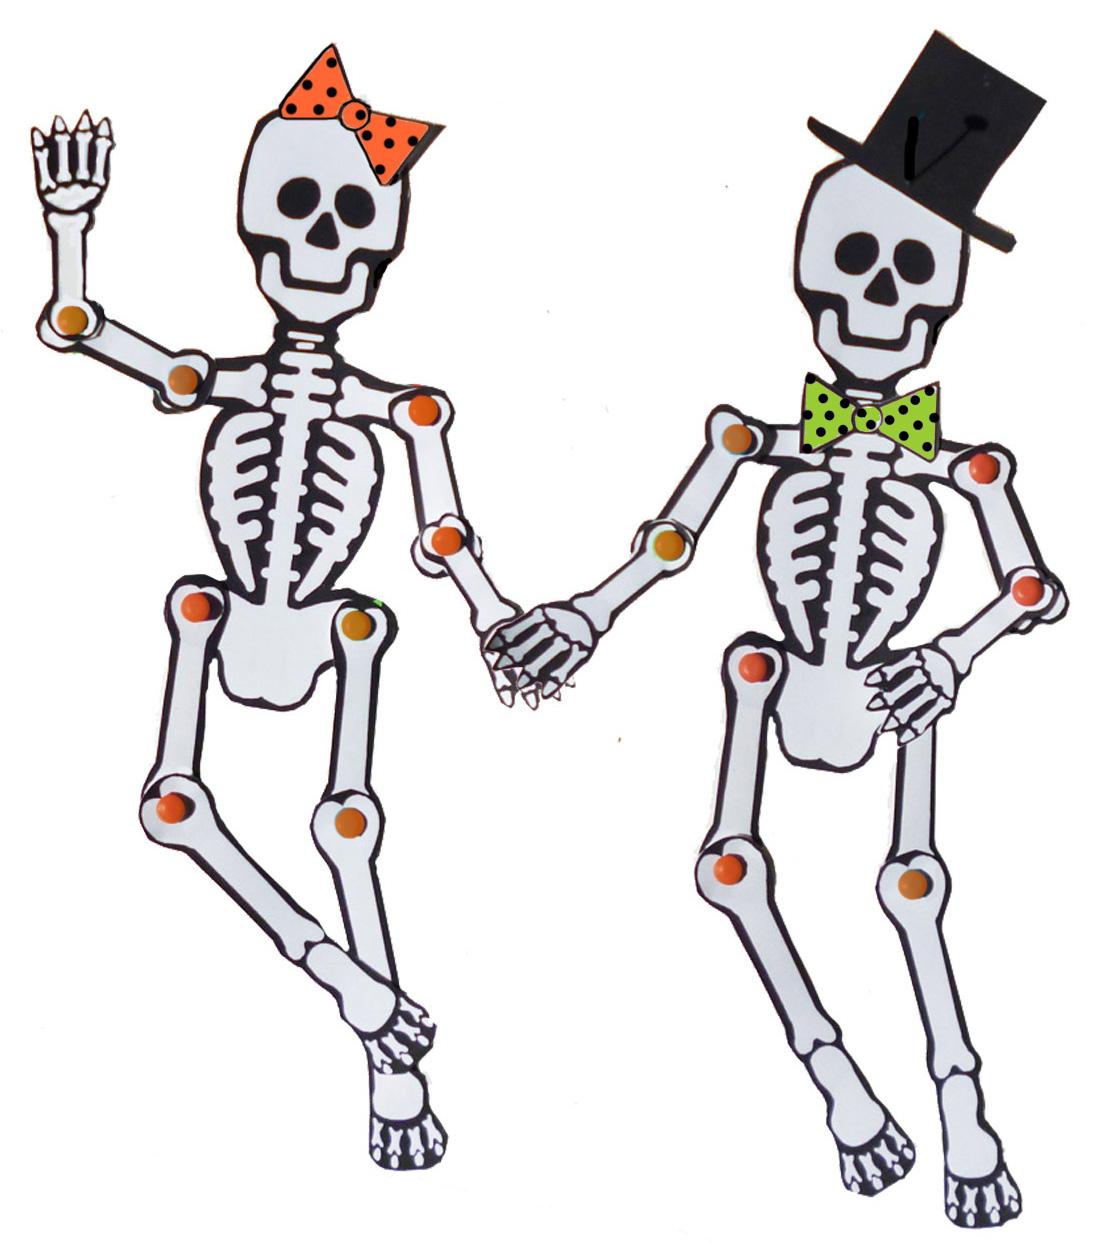 image regarding Printable Skeletons known as Skeleton Template Shots - Opposite Seem